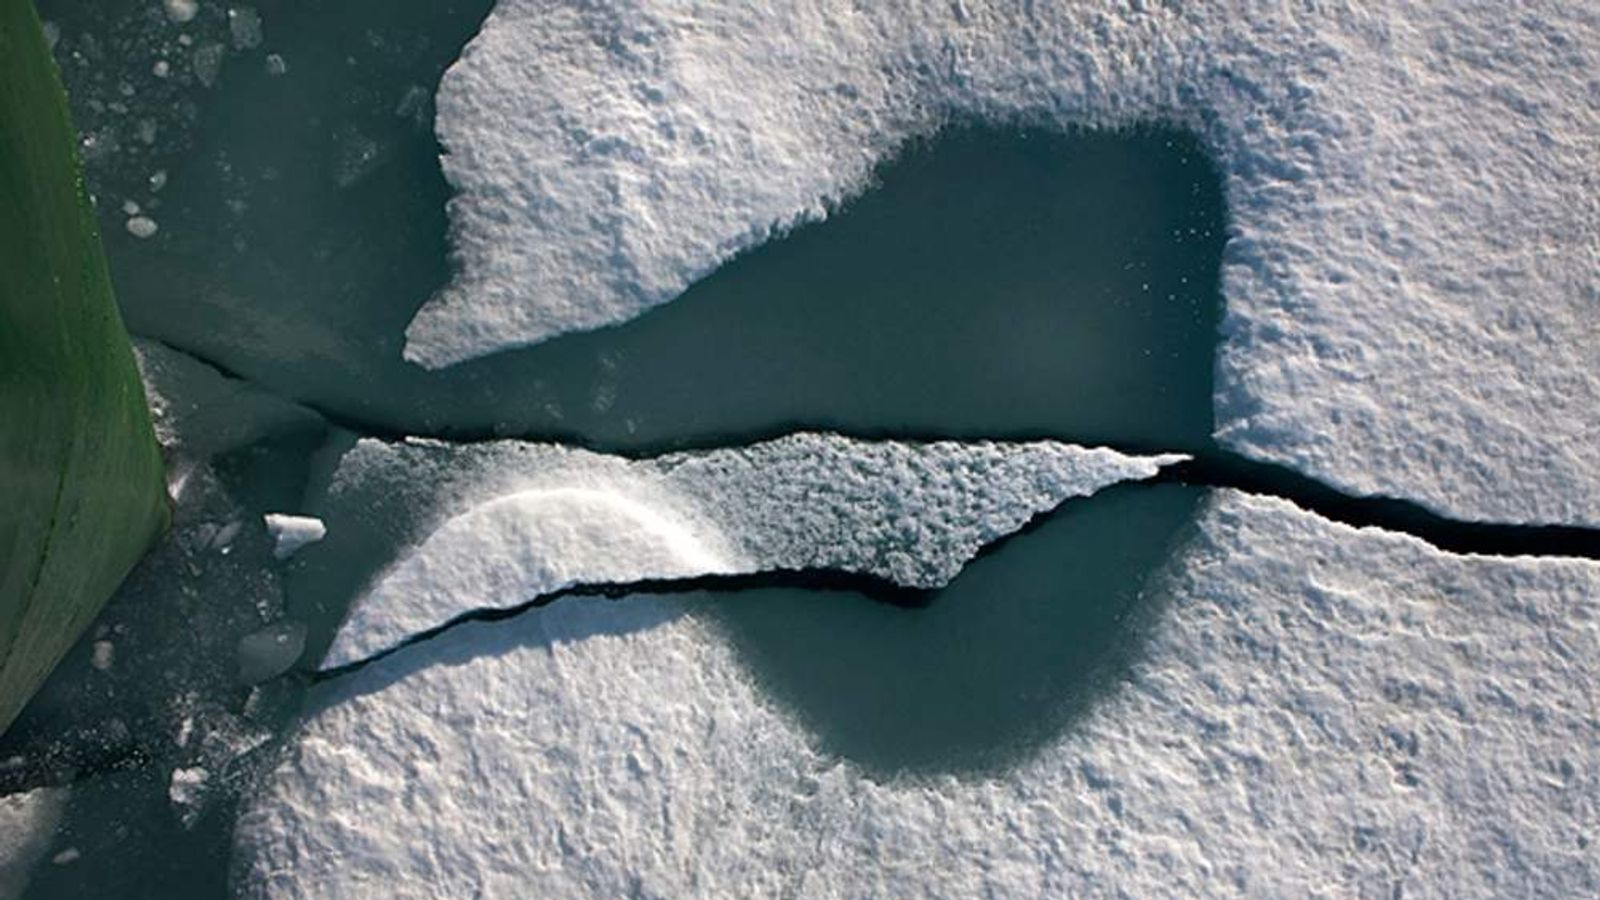 pg-greenpeace-glaciers-8